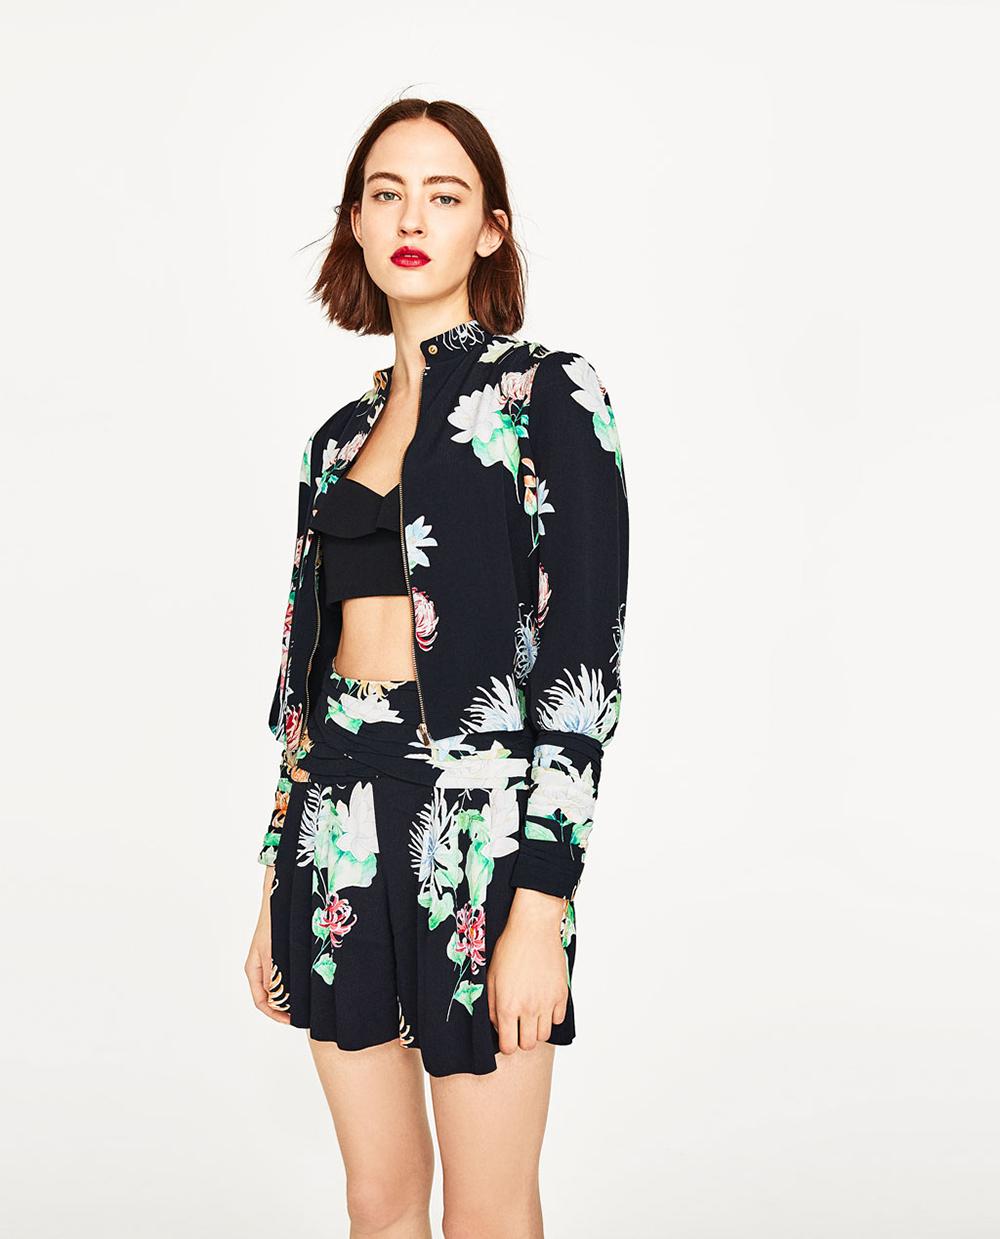 Zara Short Jacket with Floral Print